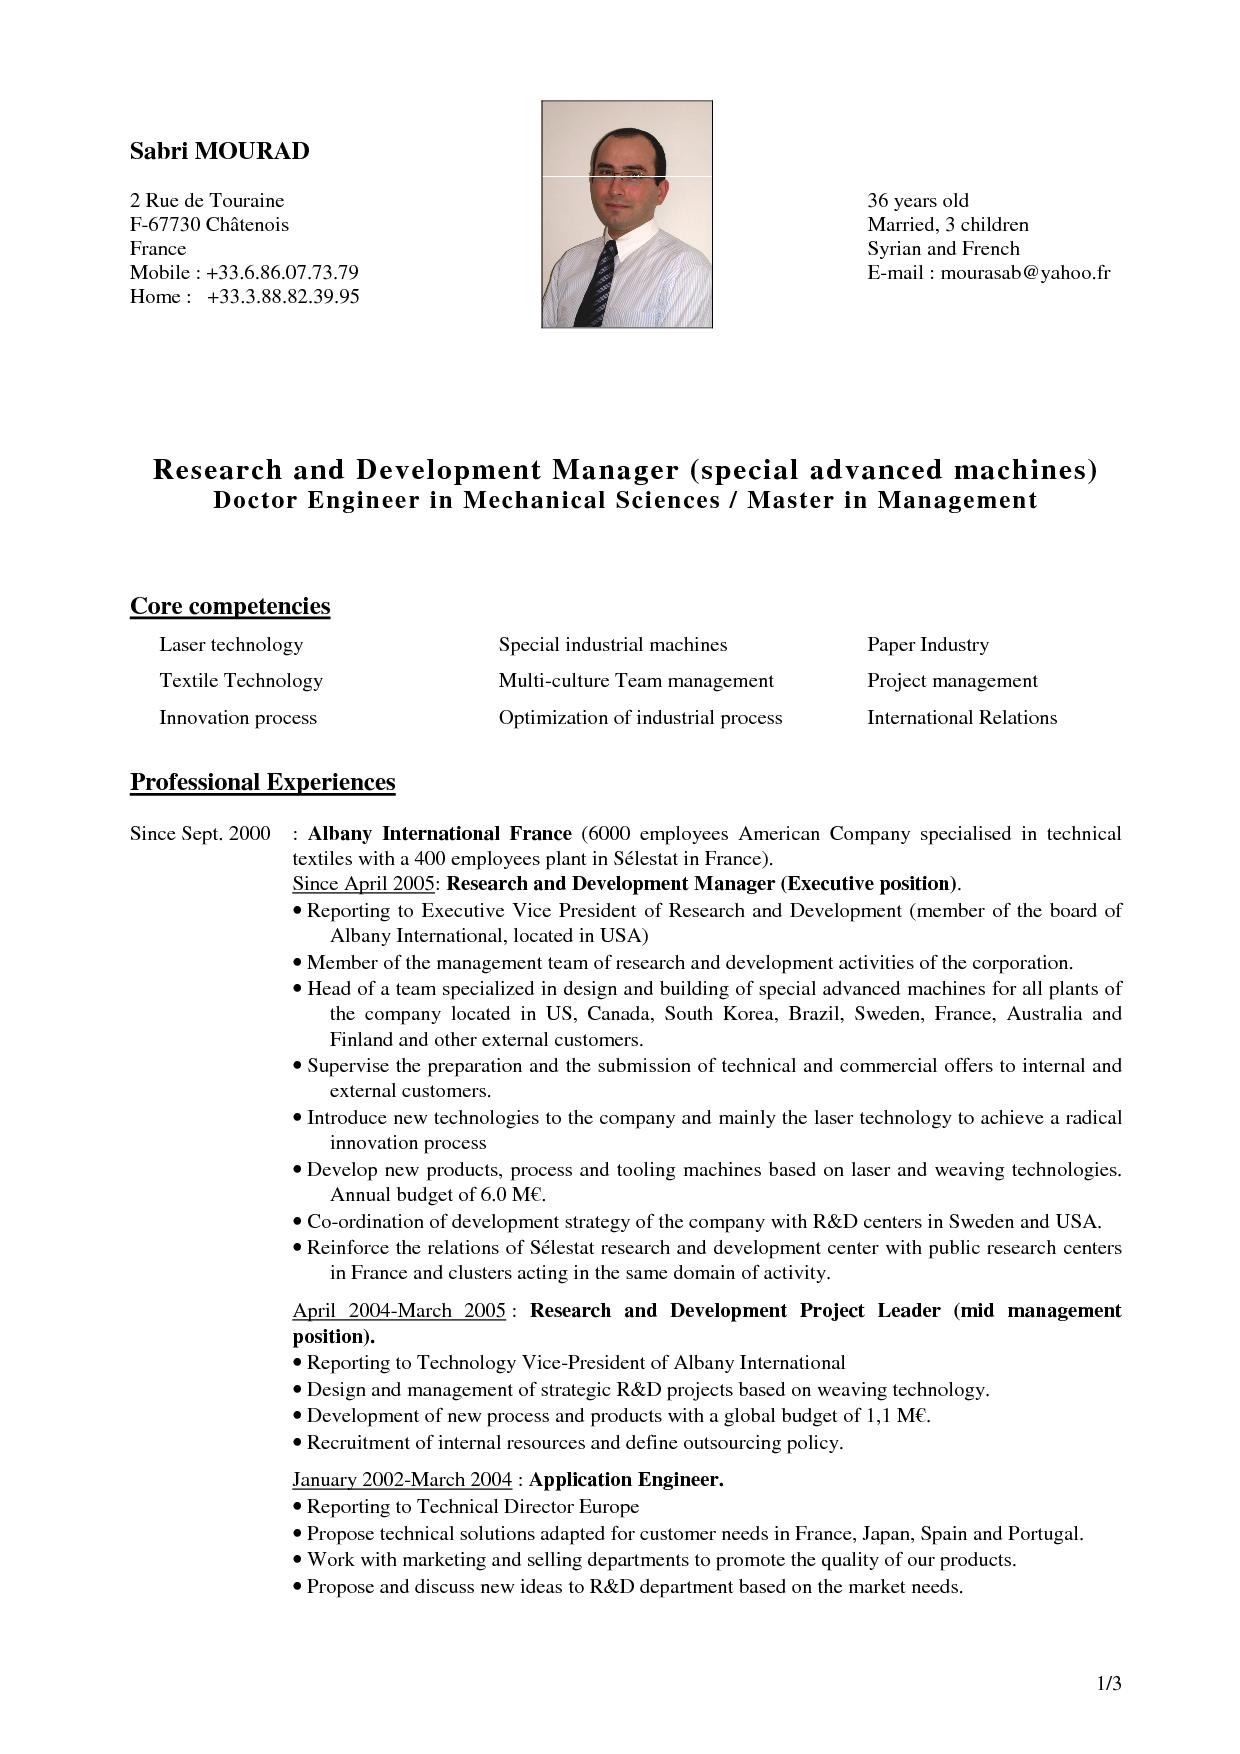 Cv Template Research Resume Format Informative Essay Cv Template Research Scientist